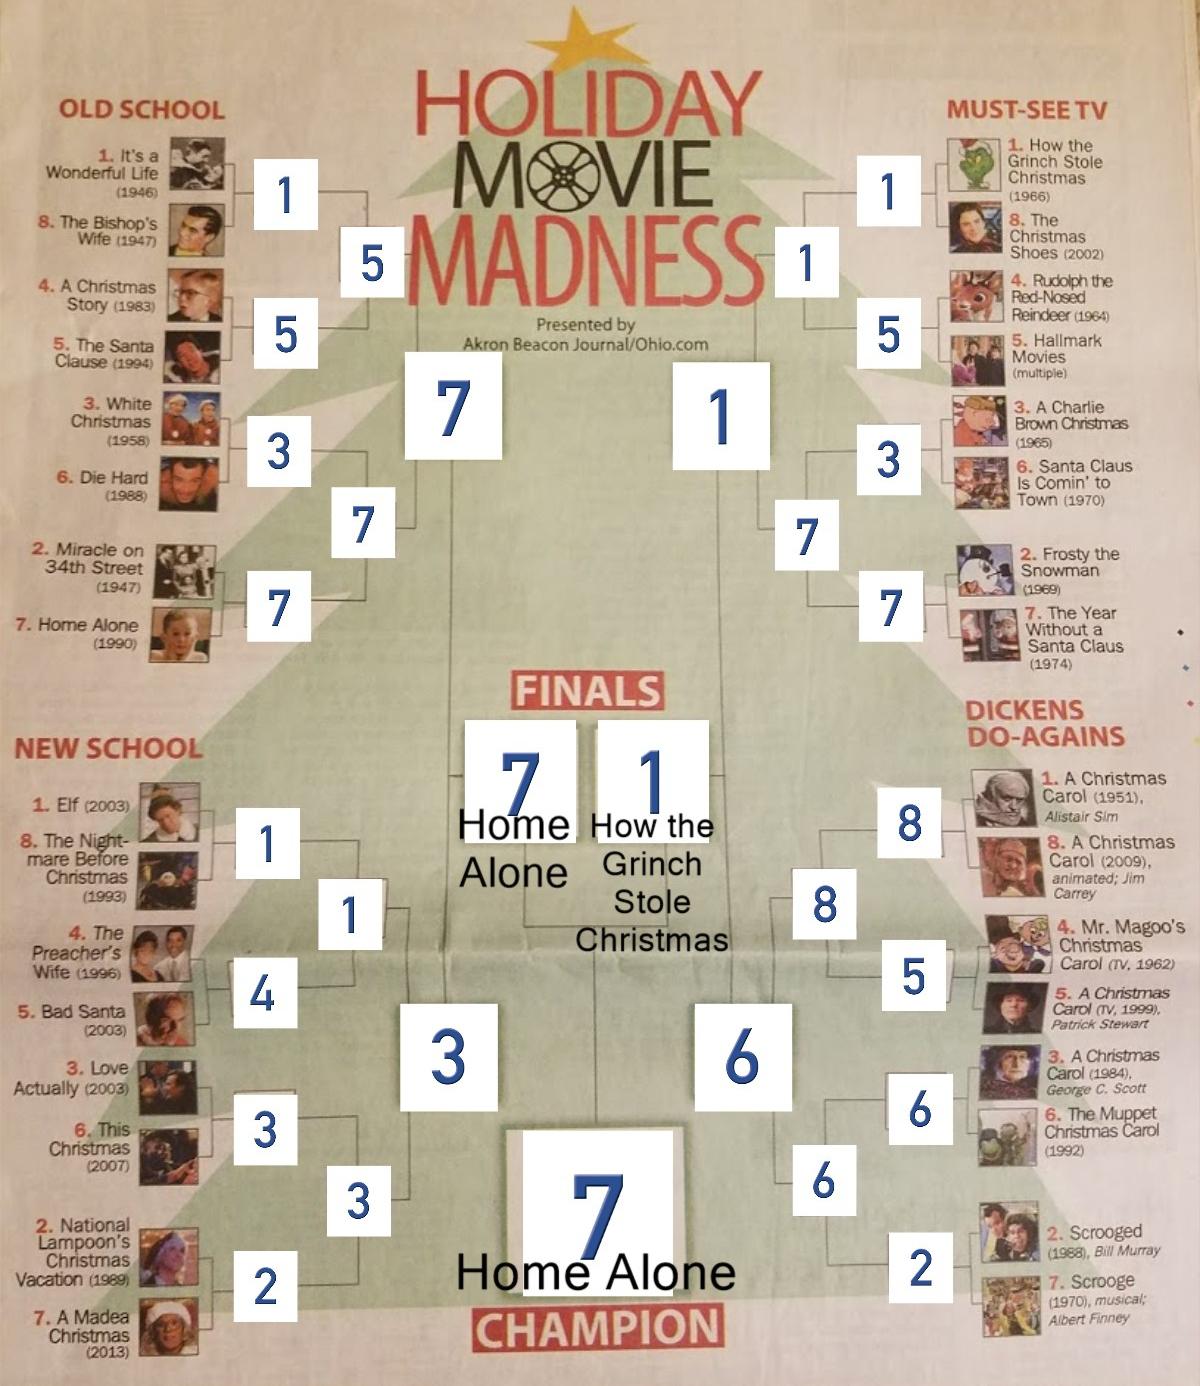 Holiday Movie Madness